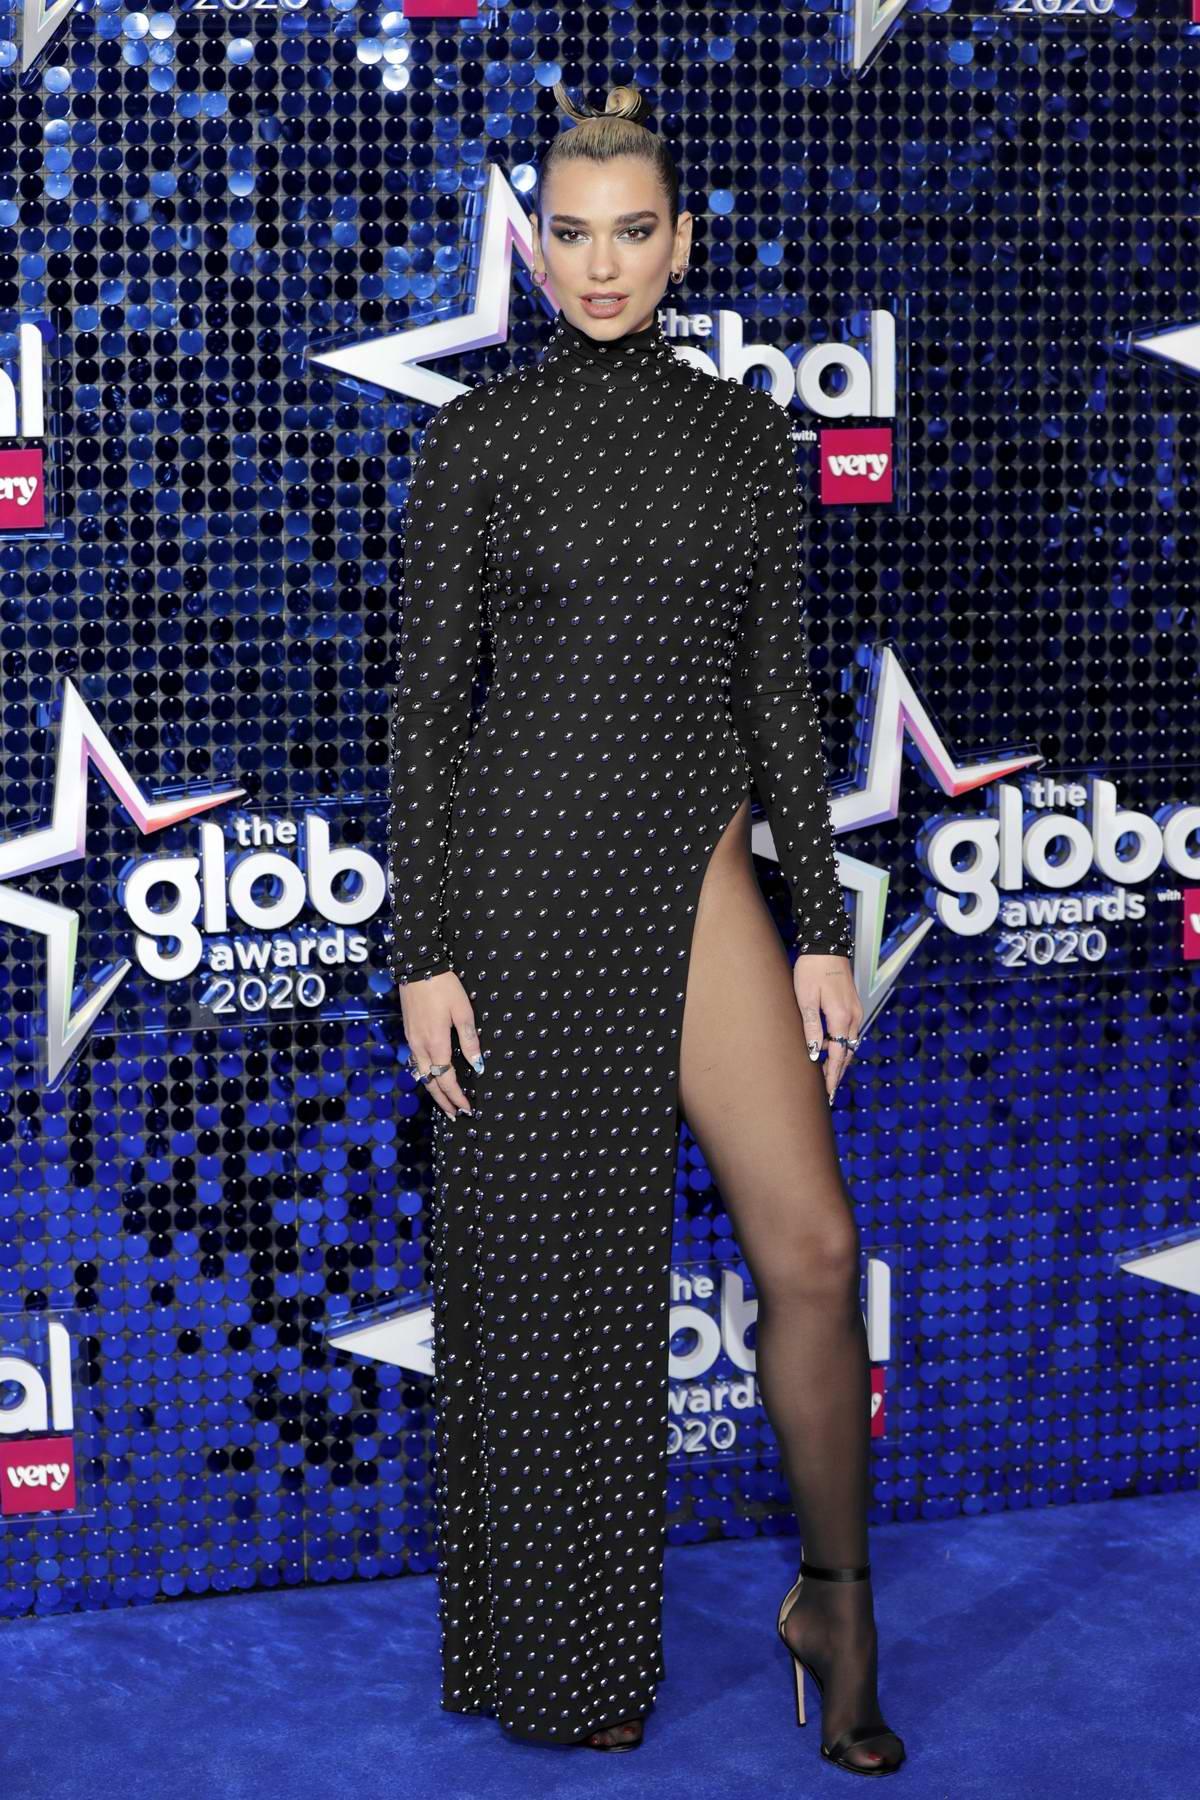 Dua Lipa attends The Global Awards 2020 at Eventim Apollo in London, UK